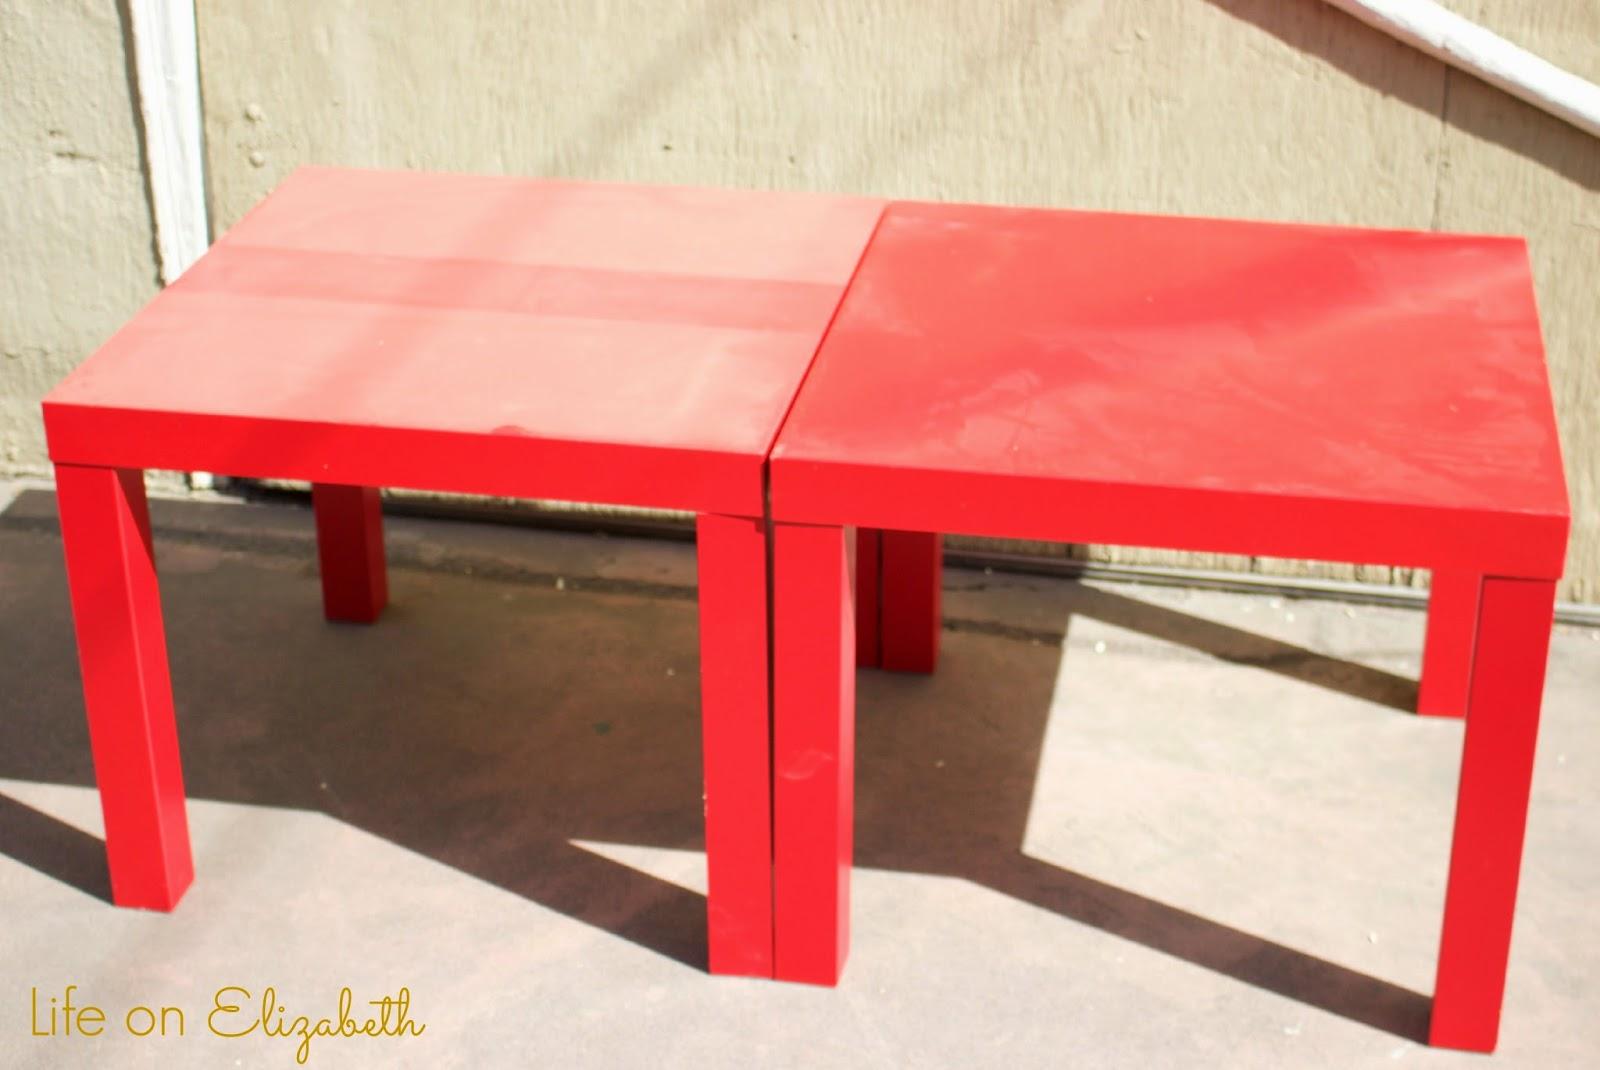 Life on elizabeth diy tufted foot stool with ikea lack side table - Ikea table lack ...